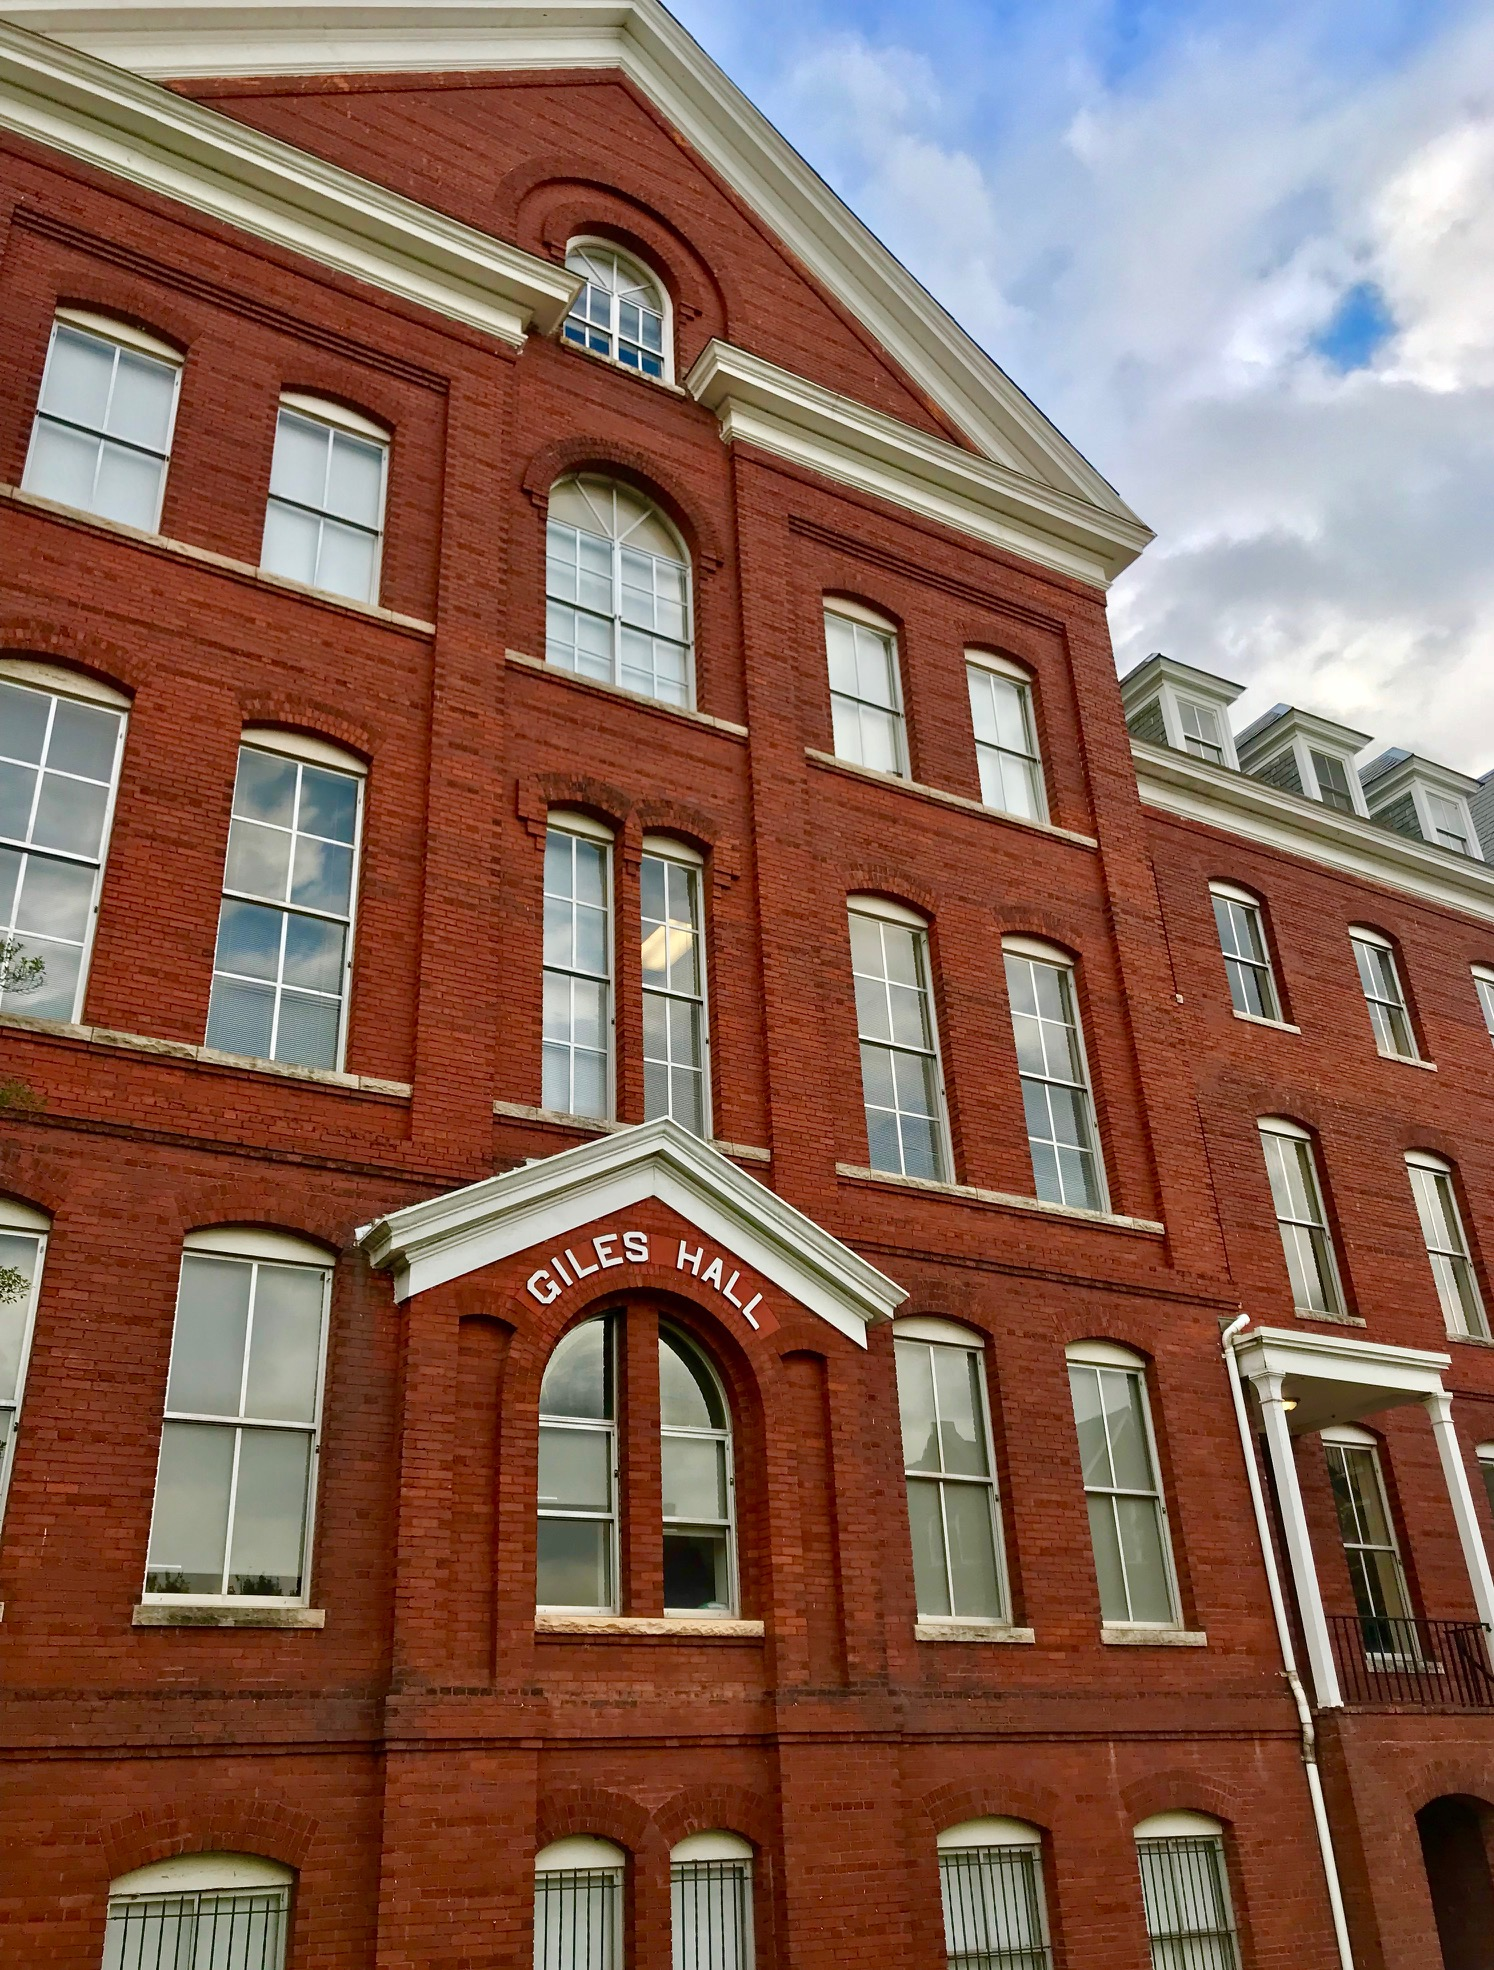 Spelman College. Photo by Kelly Jordan